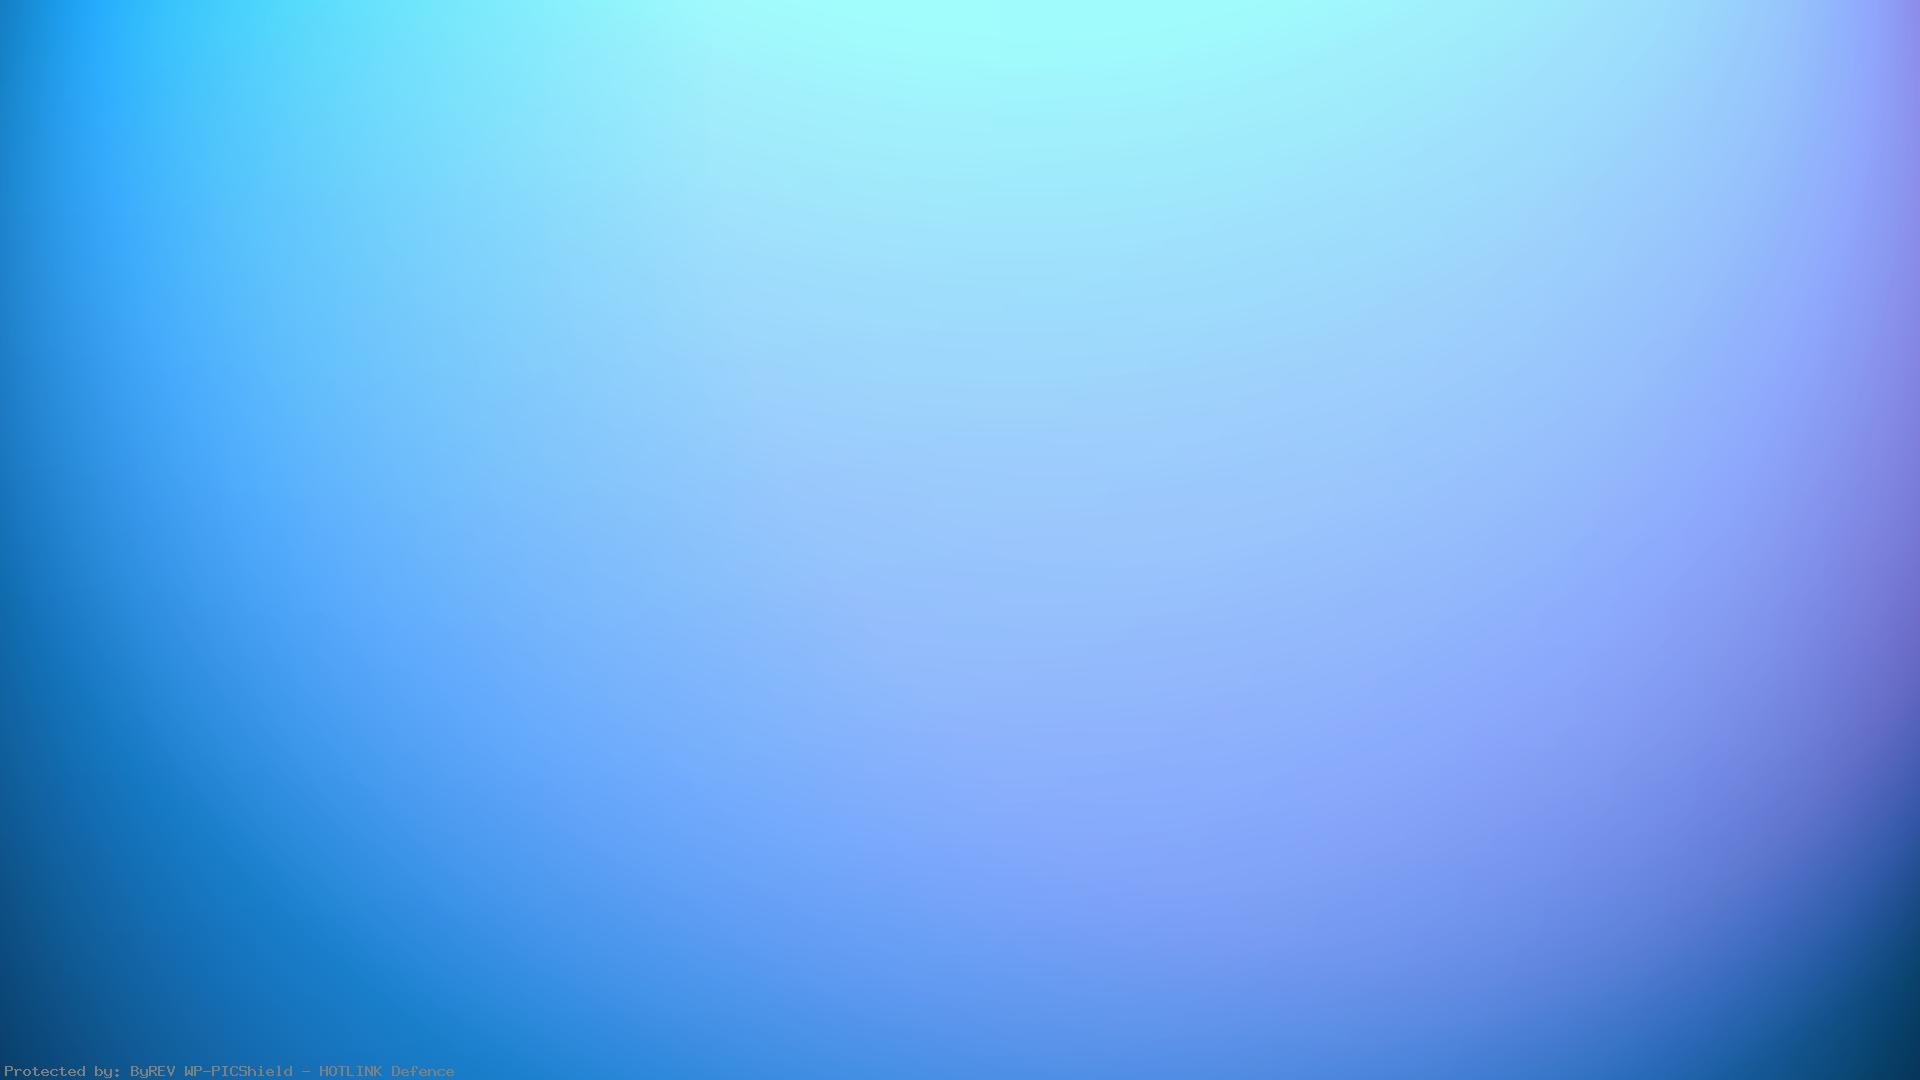 blue-white-gradient-Blue-gradient-HD-1920×1080-wallpaper-